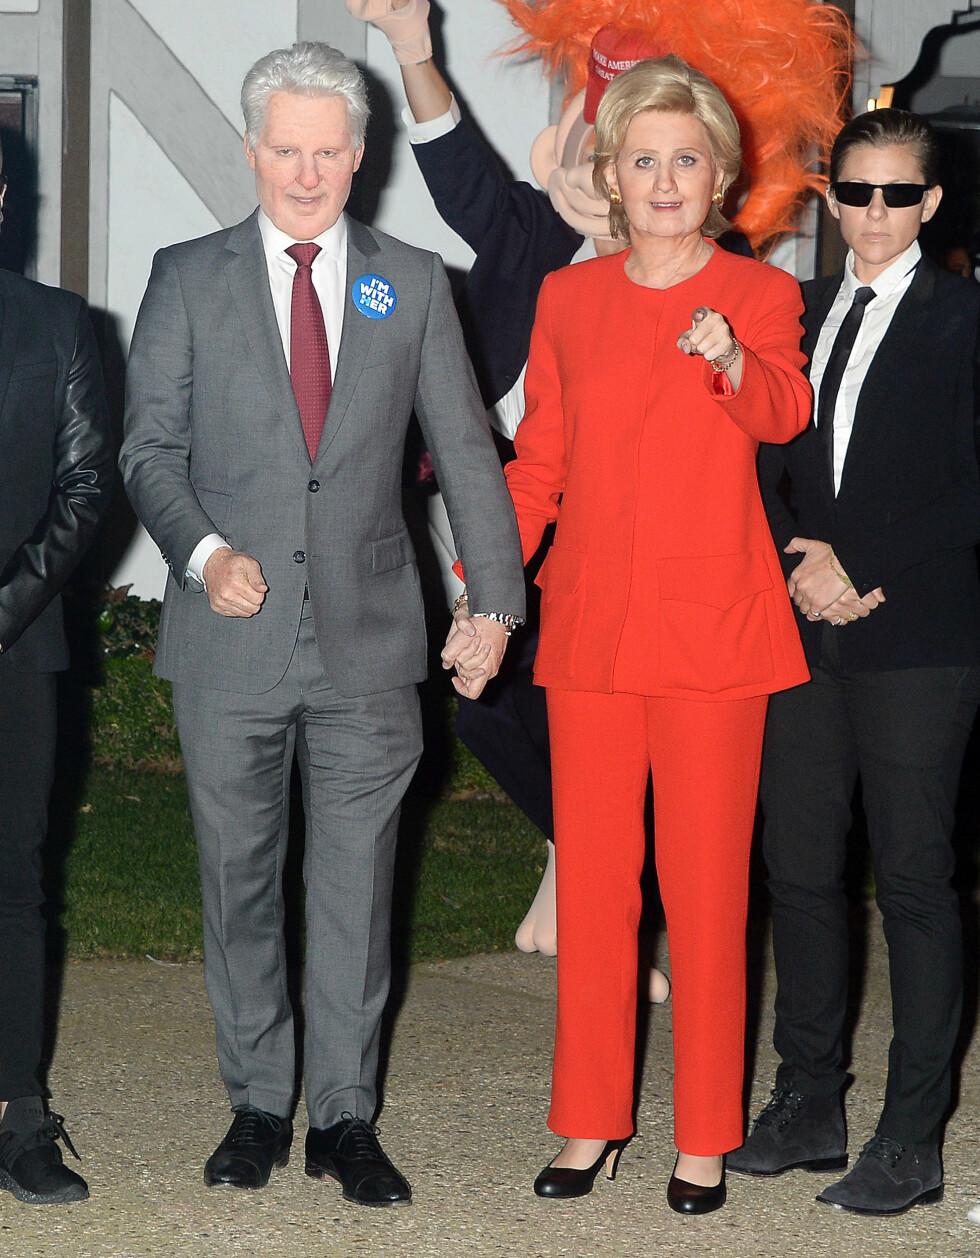 HALLOWEEN 2016: Katy Perry som Hillary Clinton og Orlando Bloom som Bill Clinton. Foto: Broadimage